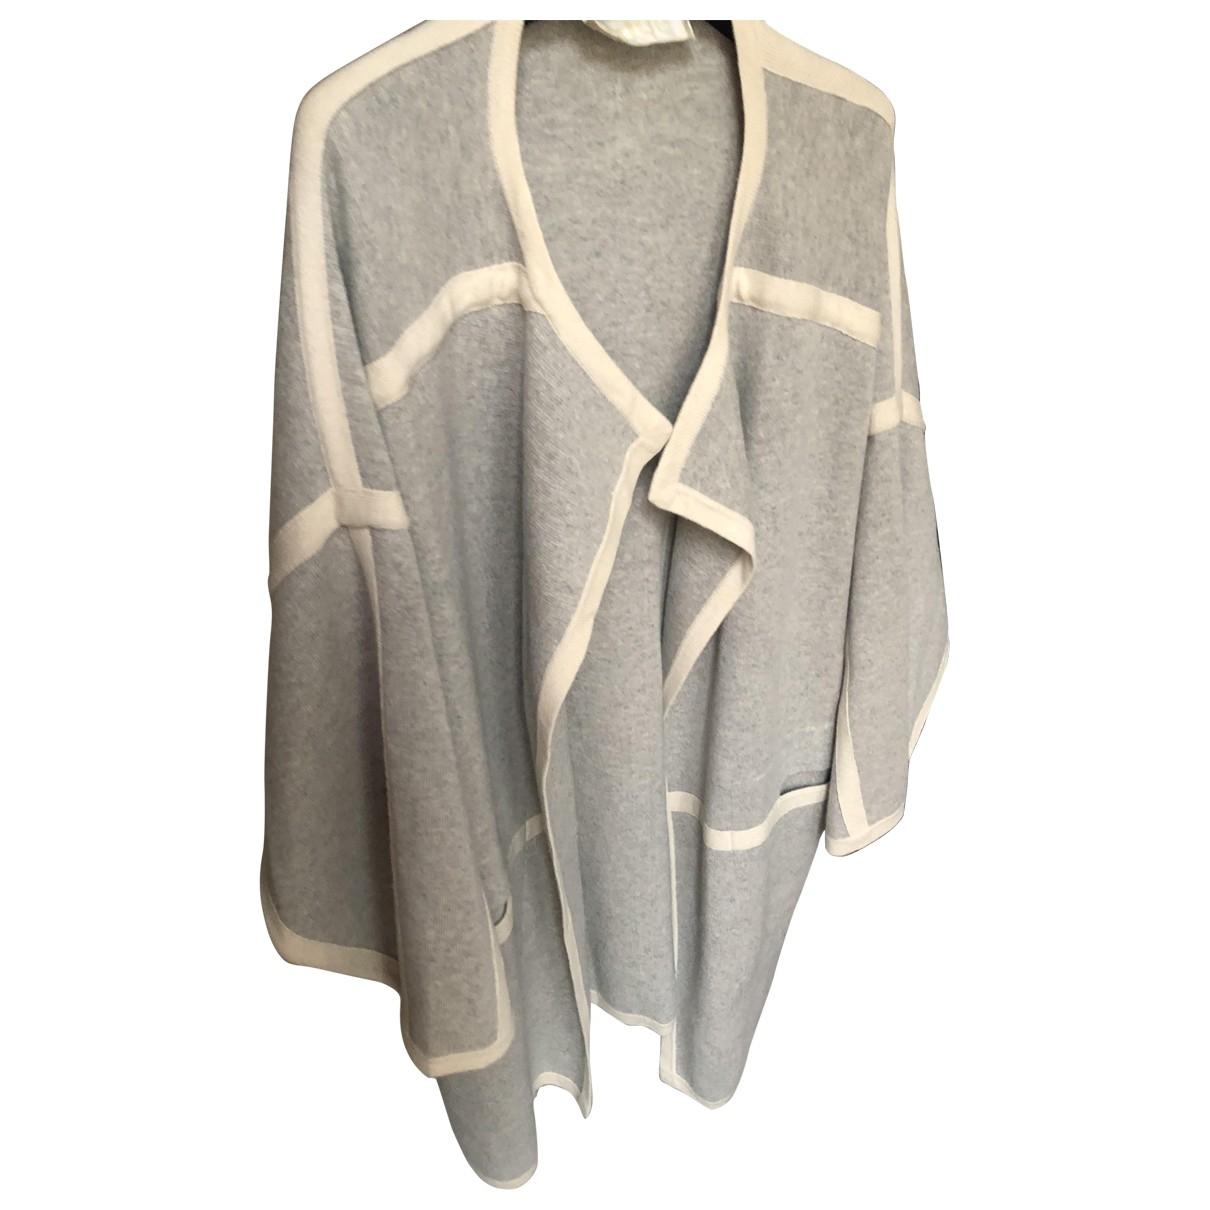 Chloé \N Grey Wool coat for Women XS International